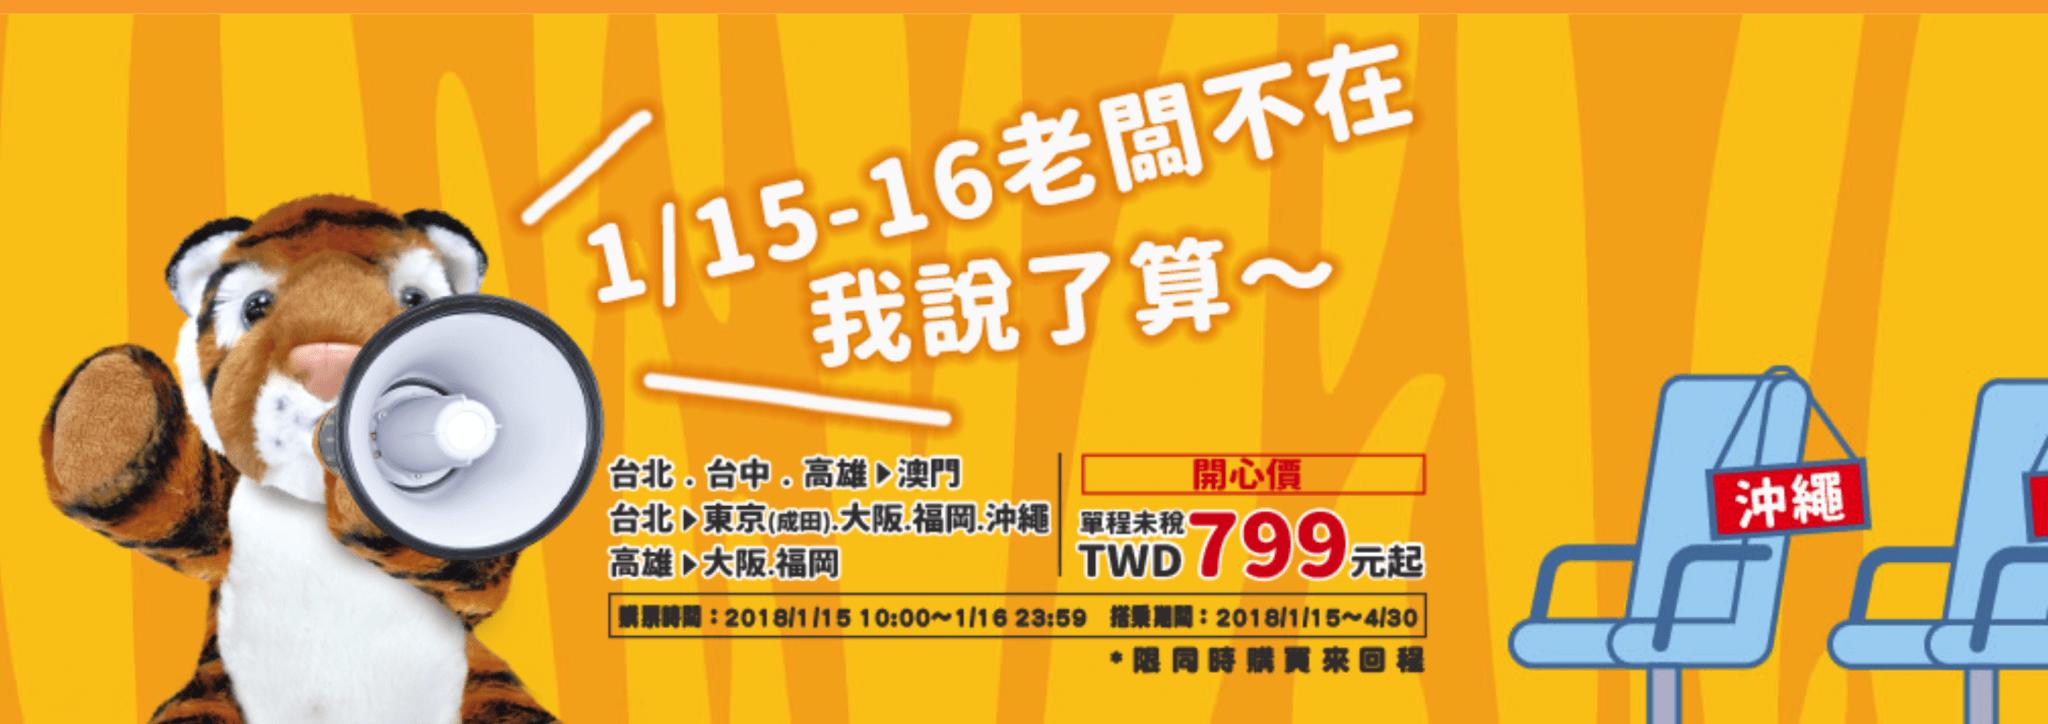 Japan Macau TigerAir Taiwan Promotion January 2018 台灣虎航 1 月優惠促銷!飛日本、澳門最便宜 799 元起